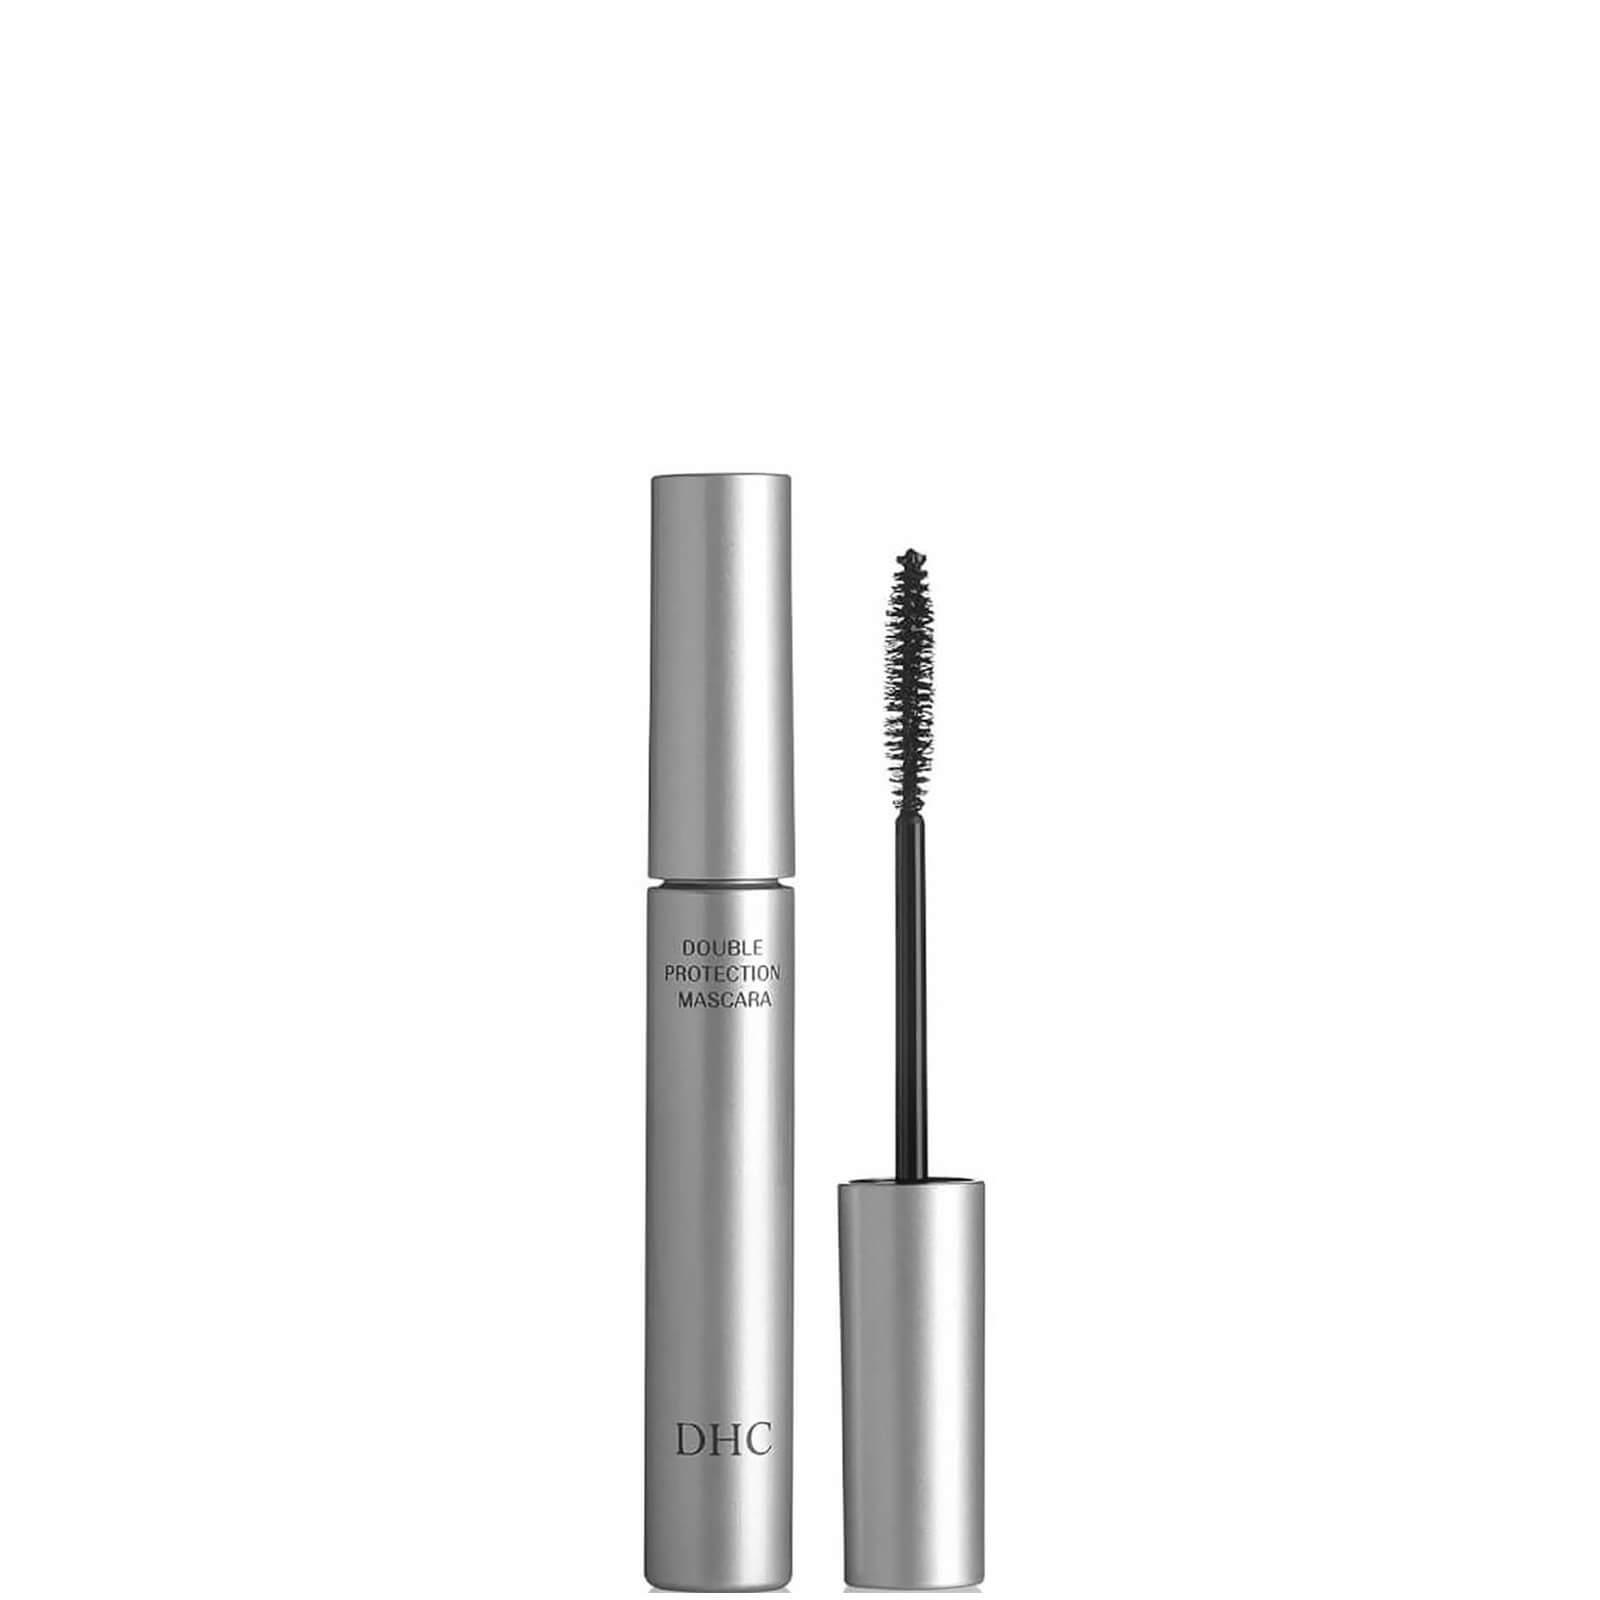 Тушь для ресниц DHC Perfect Pro Double Protection Mascara - Black  - Купить